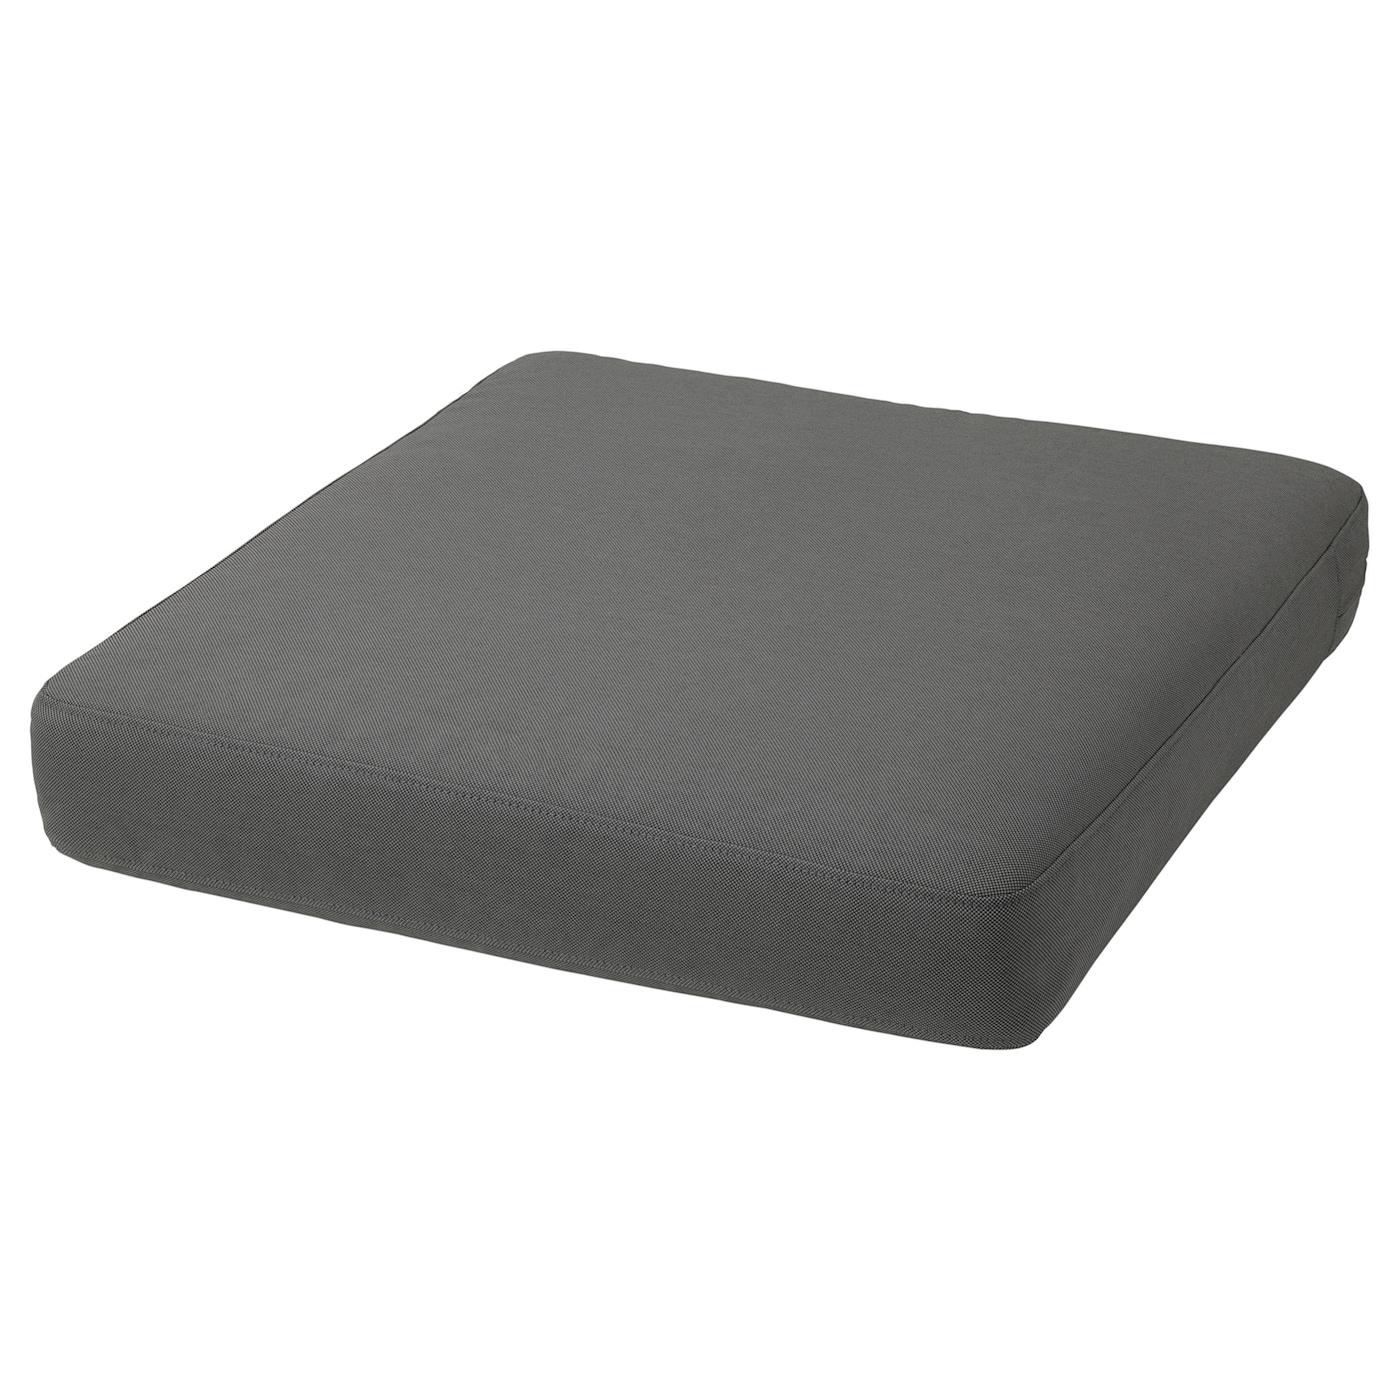 FRÖSÖN/DUVHOLMEN Seat cushion, outdoor - dark grey 9x9 cm